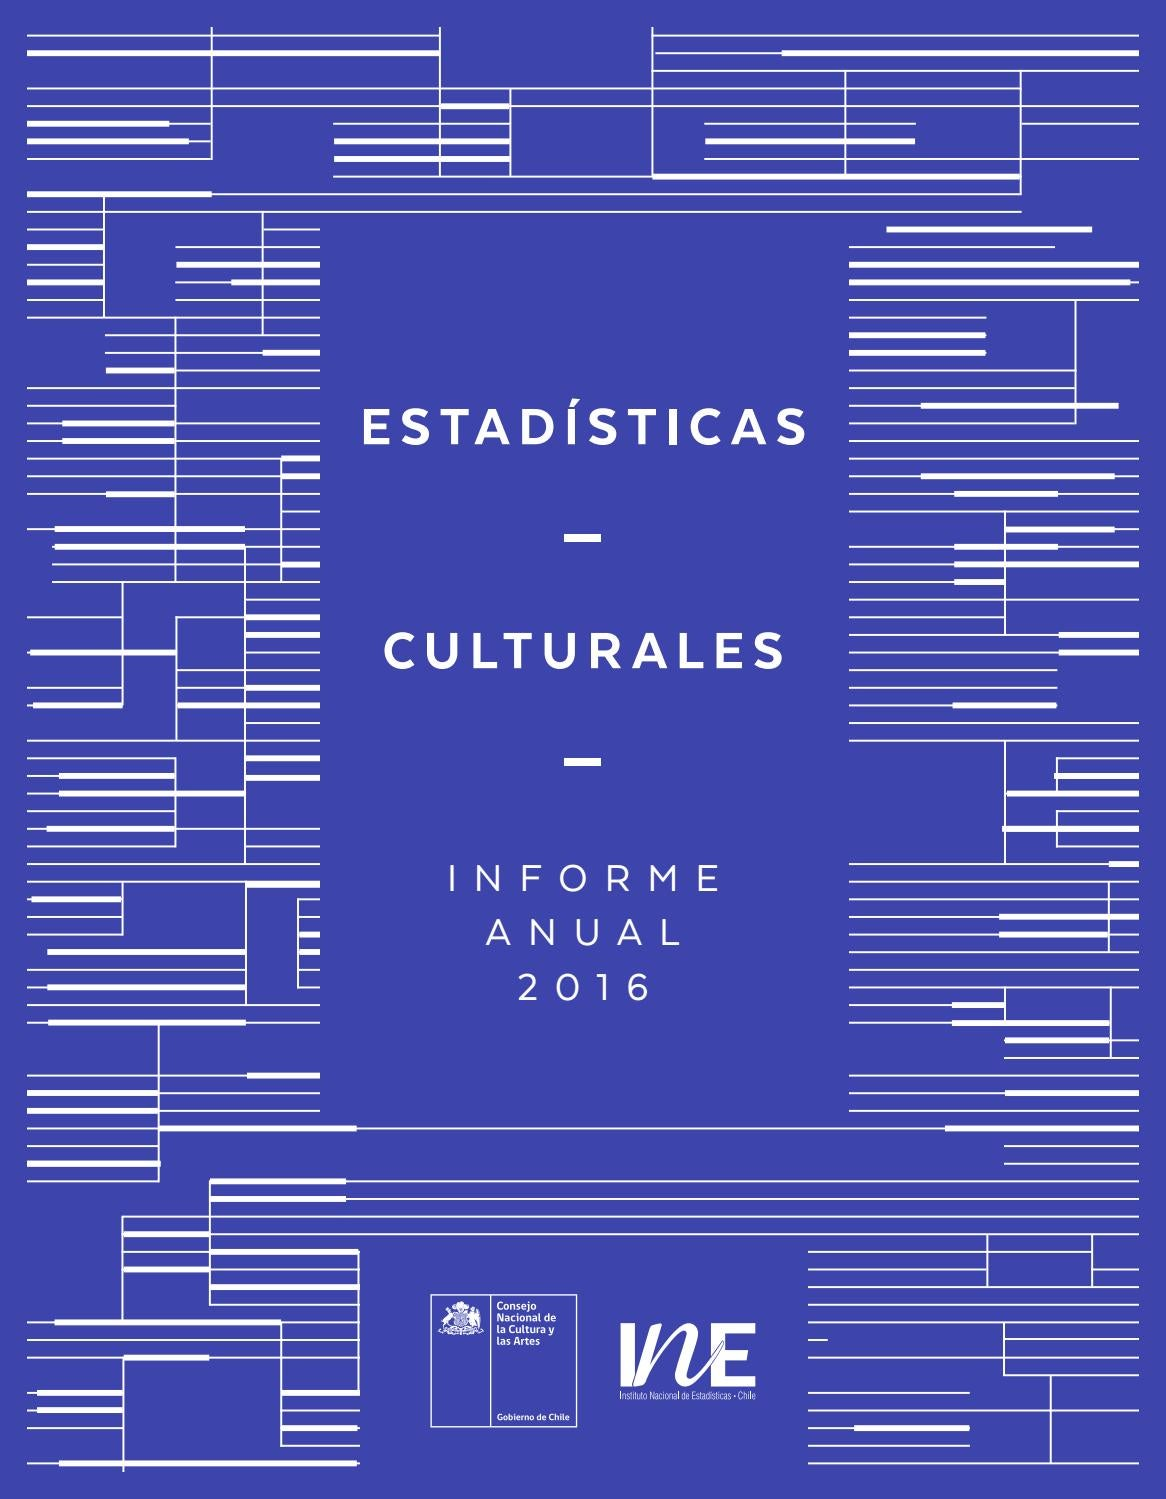 Muebles Loa Sur Ancud - Estad Sticas Culturales Informe Anual 2016 By Consejo Nacional De [mjhdah]https://image.isu.pub/171013025123-6cca87443edb465298d8f5287ef48c7a/jpg/page_1.jpg